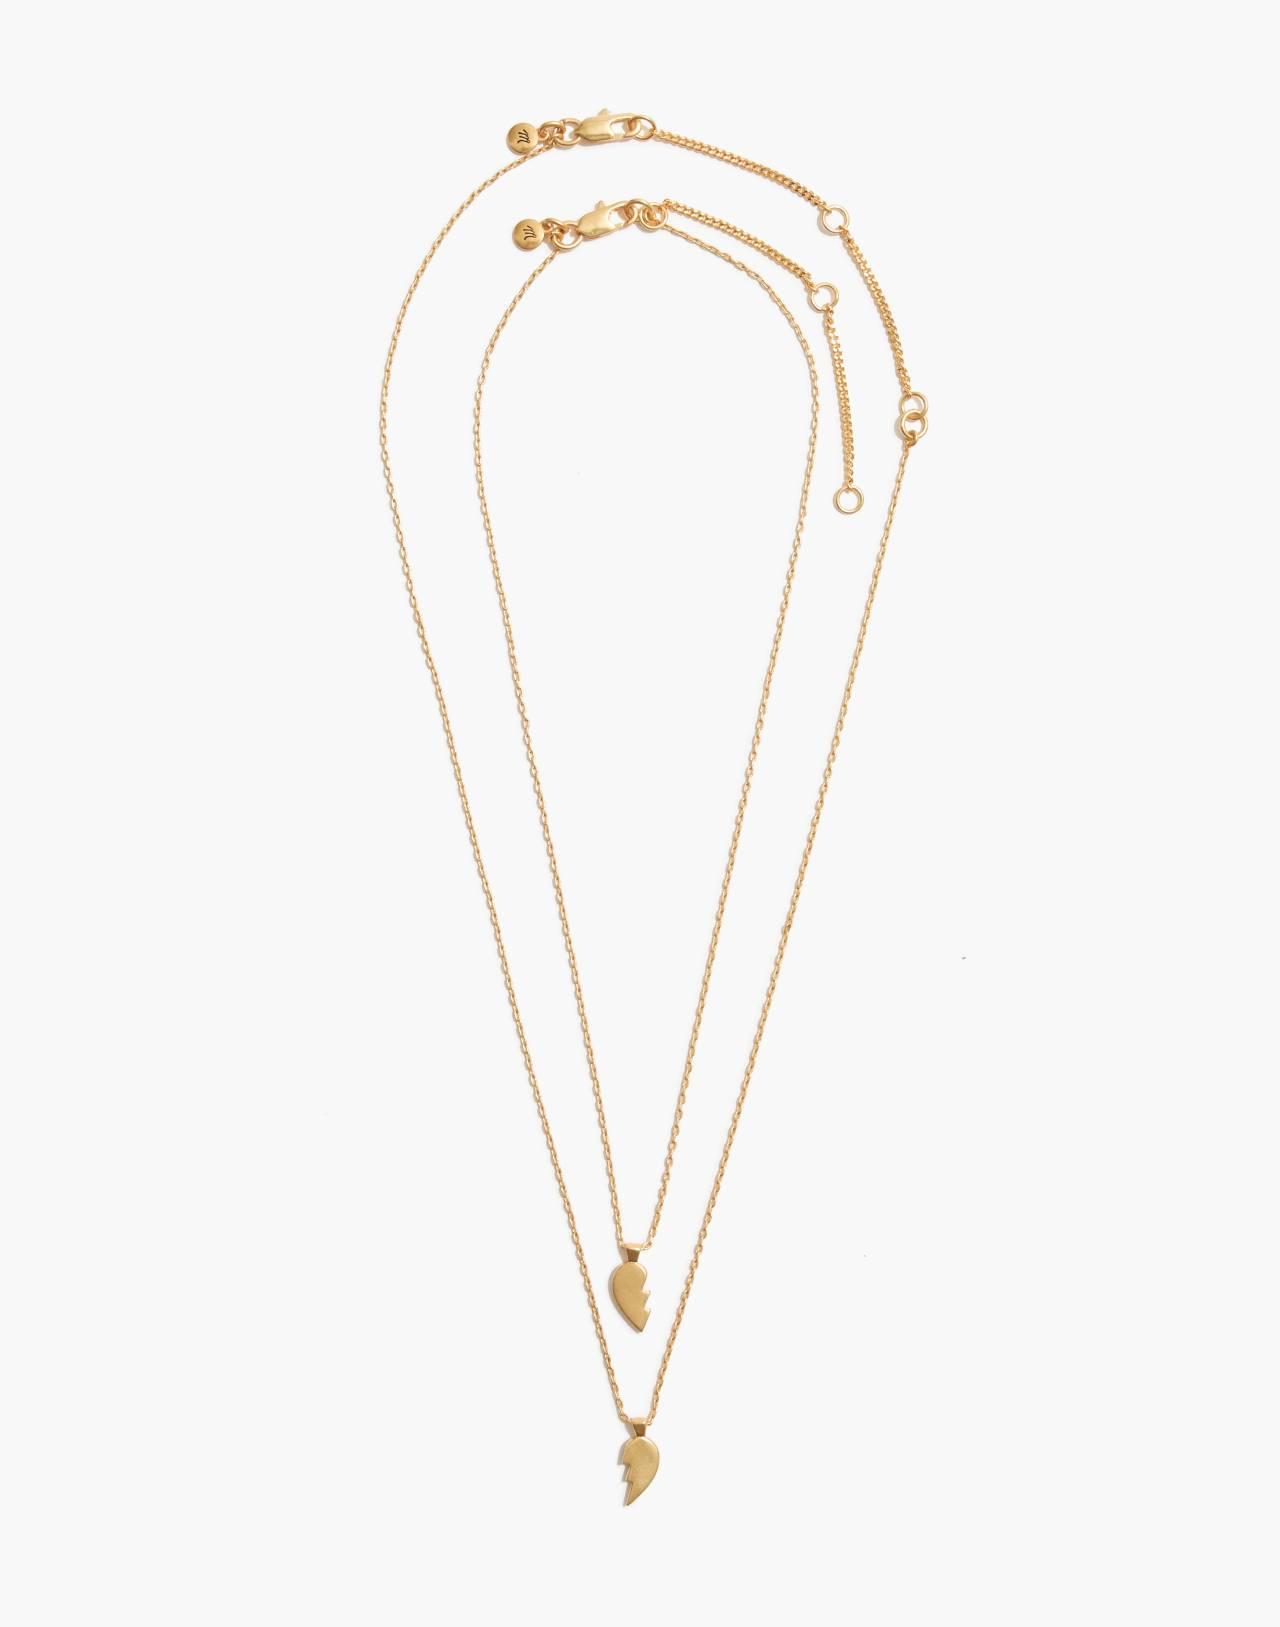 Heartbreak Friendship Necklace Set in vintage gold image 2